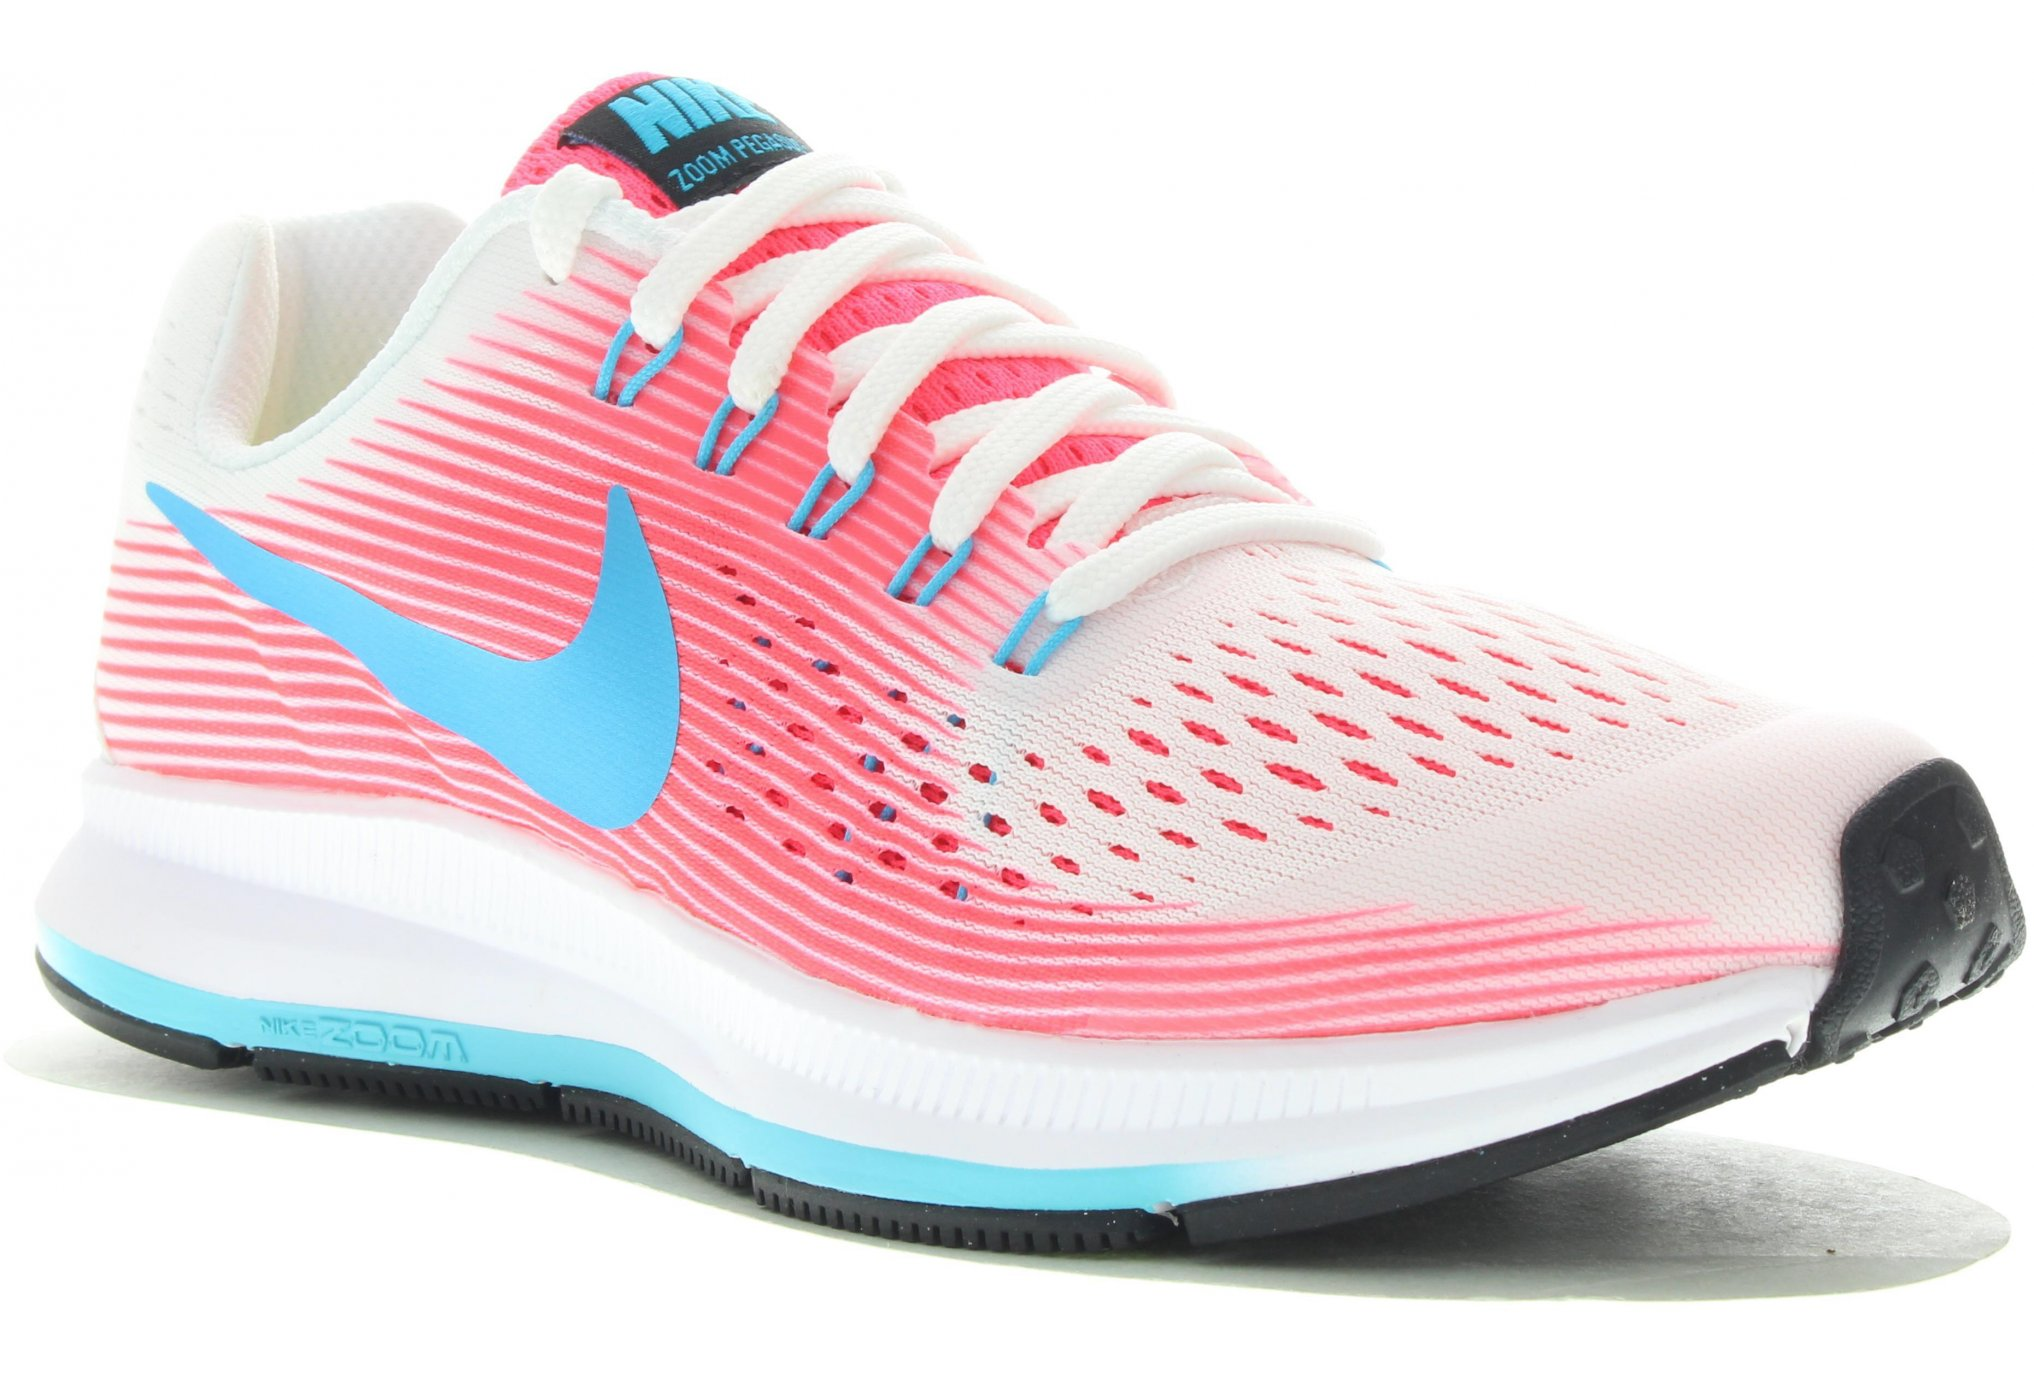 separation shoes 126e7 88d41 Nike Air Zoom Pegasus 34